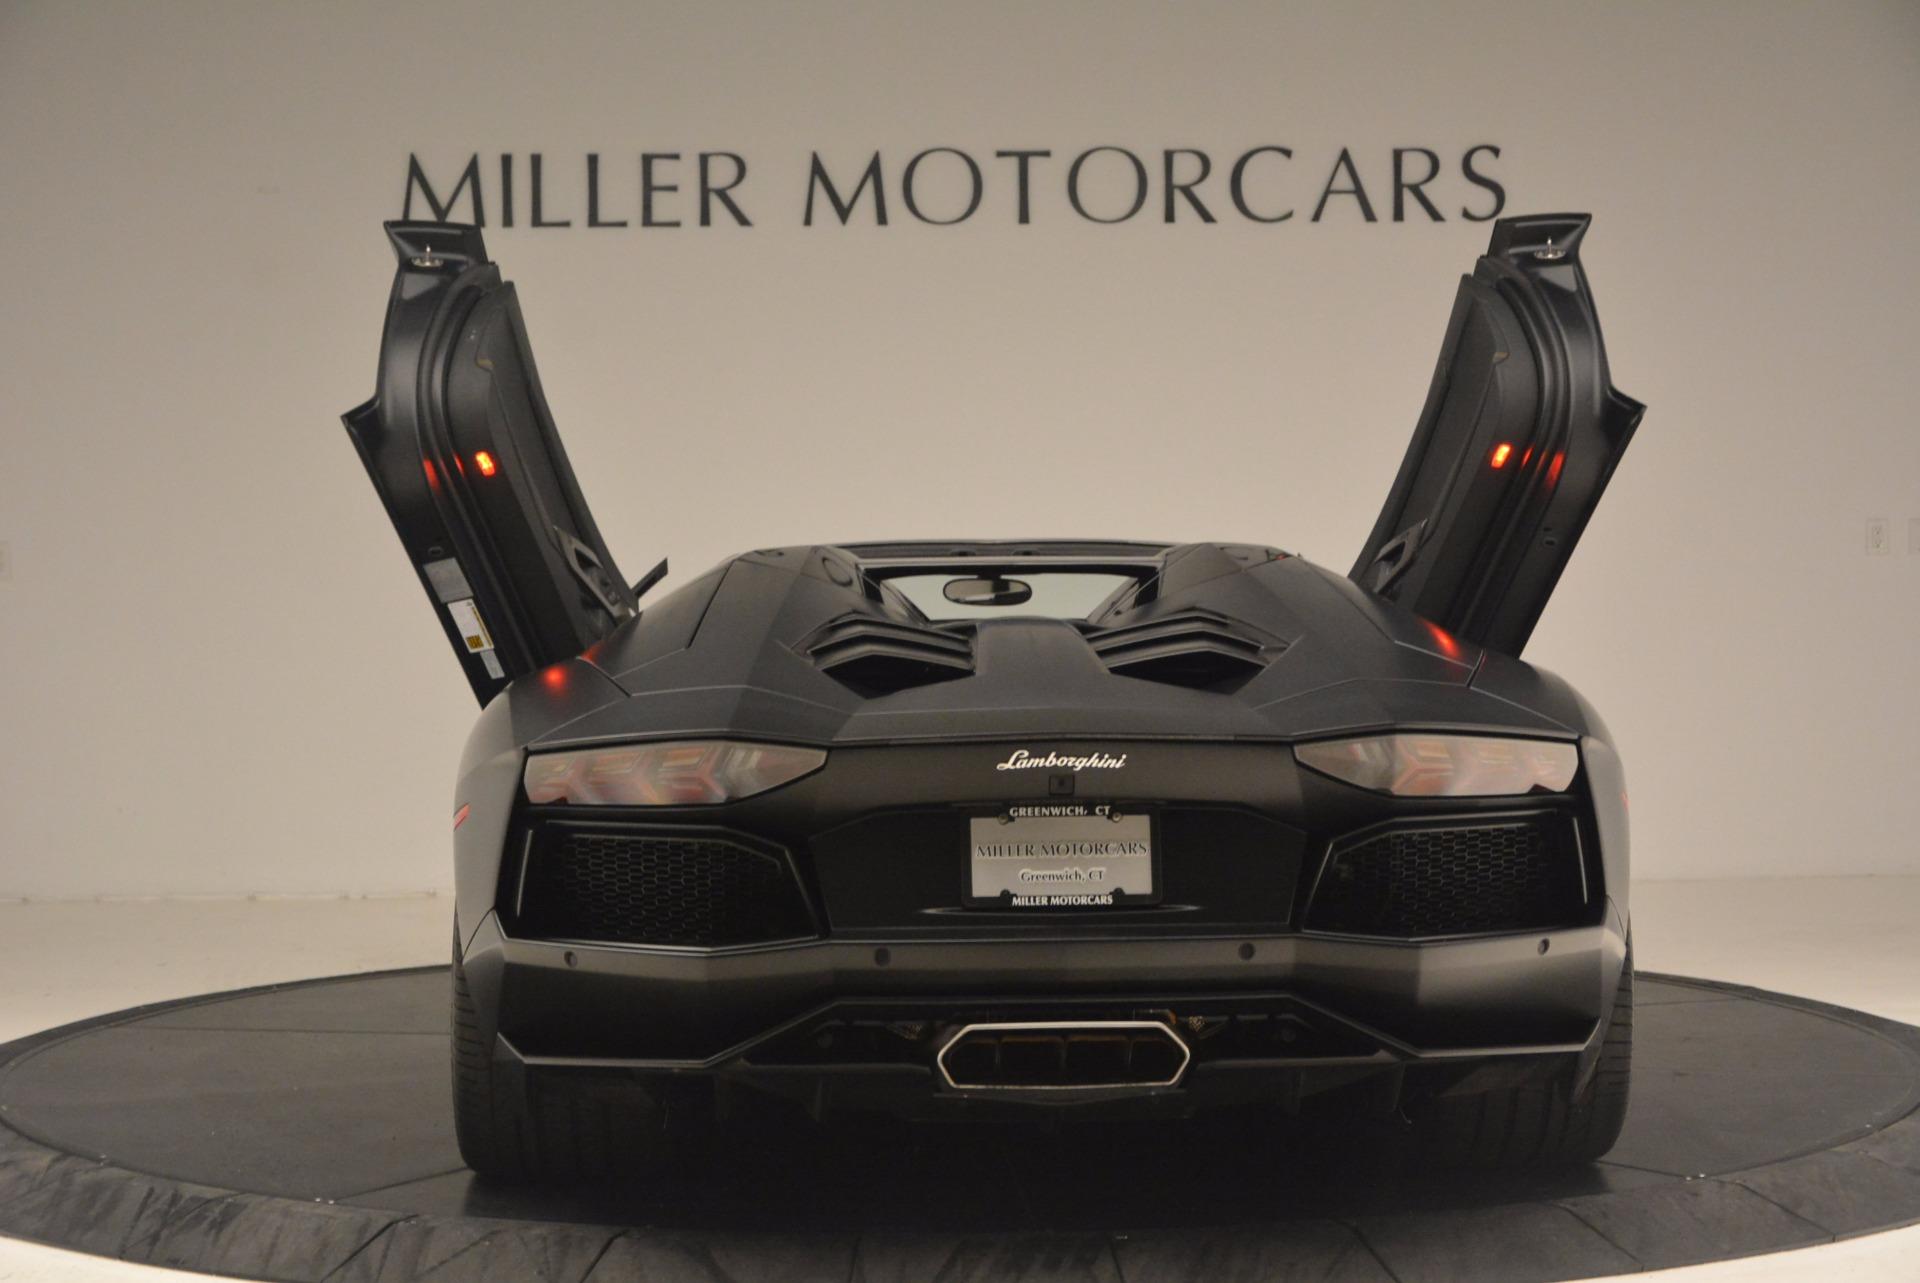 Used 2015 Lamborghini Aventador LP 700-4 For Sale In Westport, CT 1217_p15